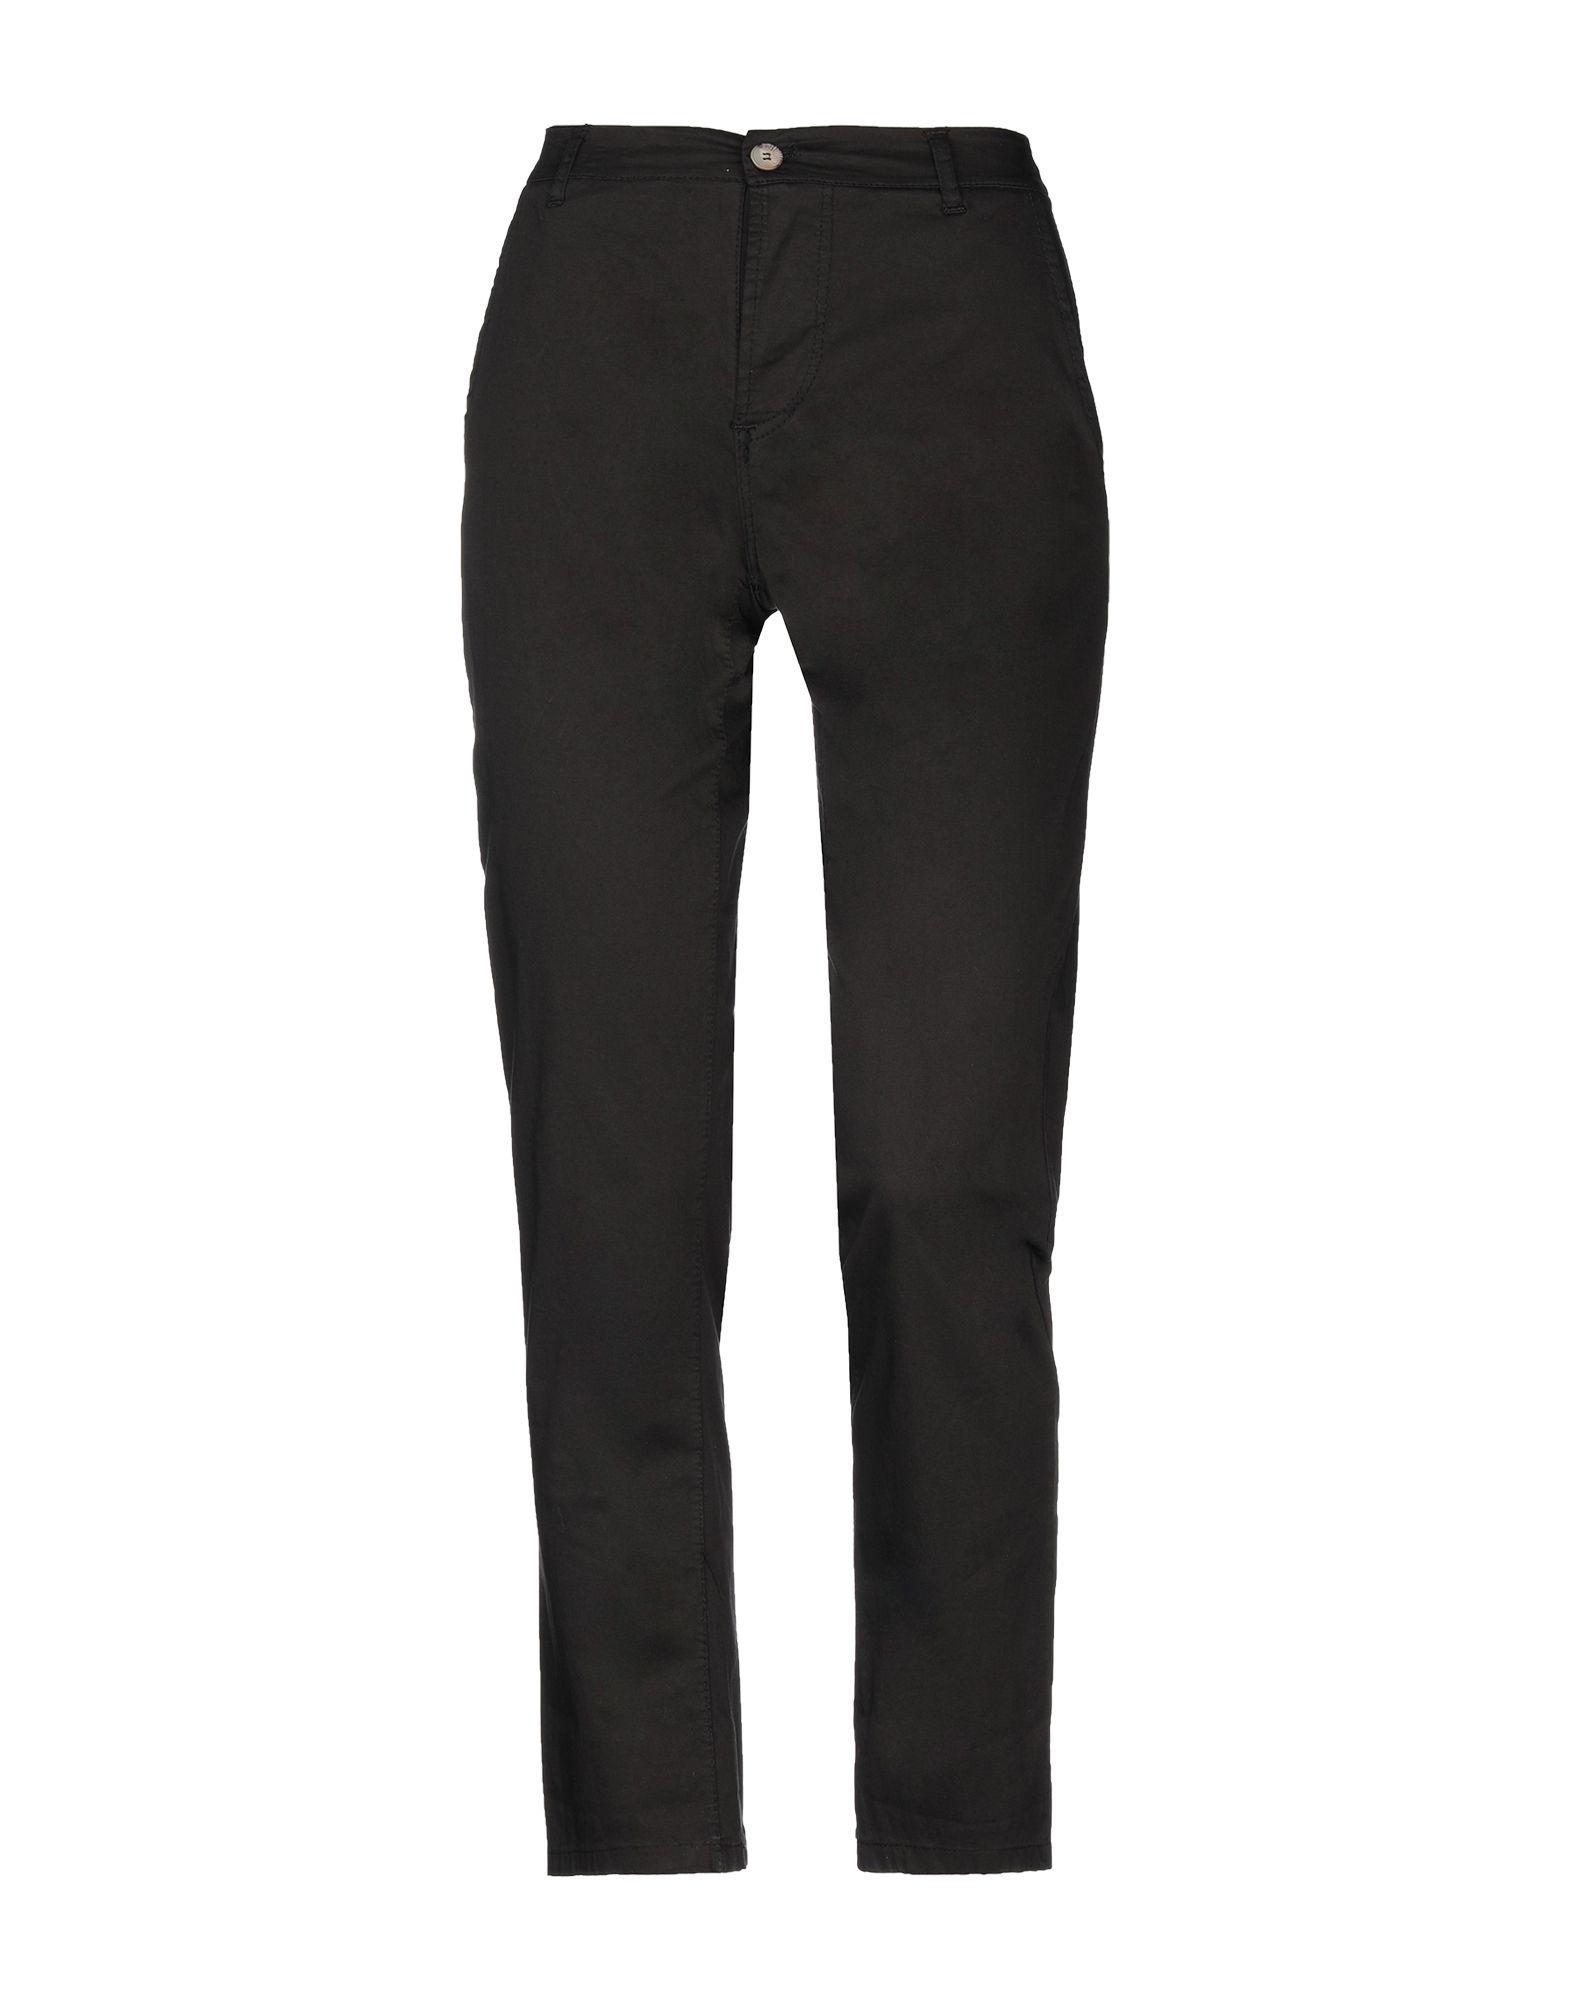 ANDREA MORANDO Повседневные брюки 19 70 genuine wear повседневные брюки